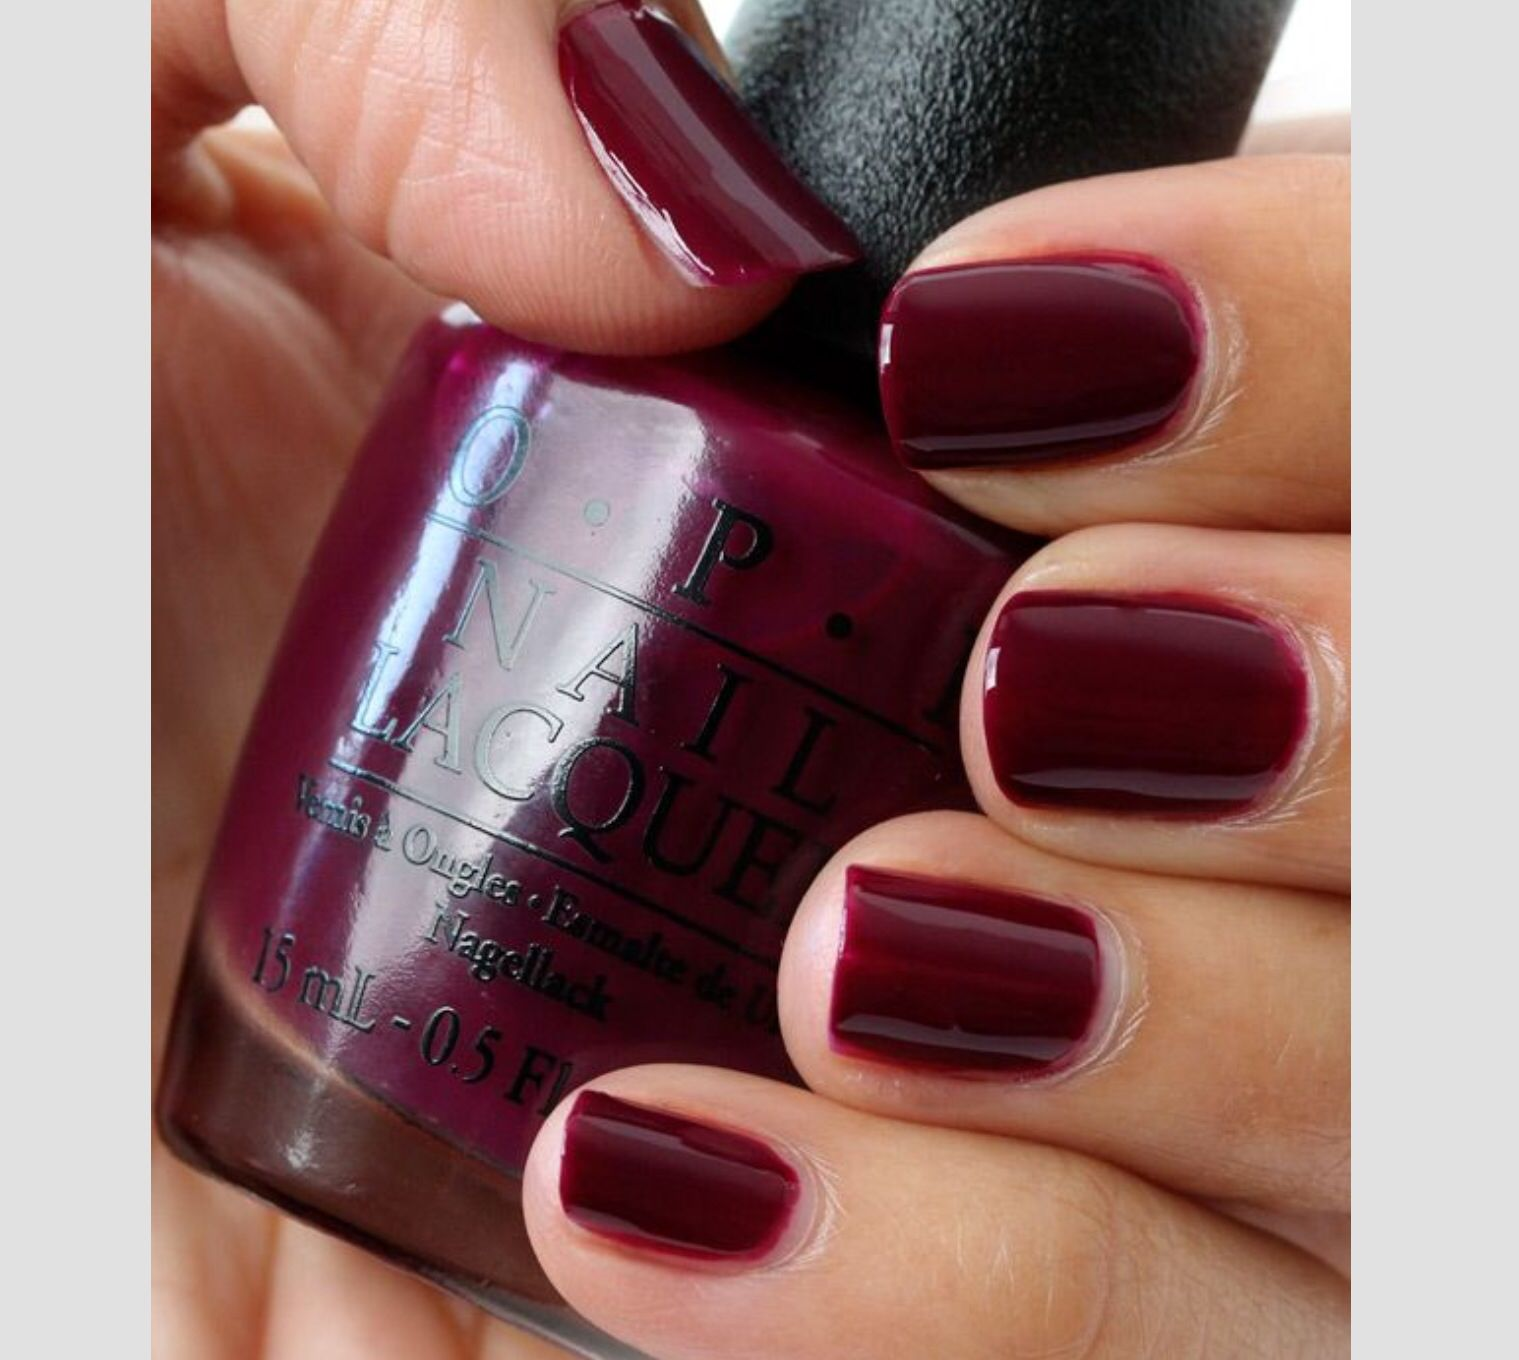 Pin by Susie Q on Nails | Pinterest | Nail nail, OPI and Makeup